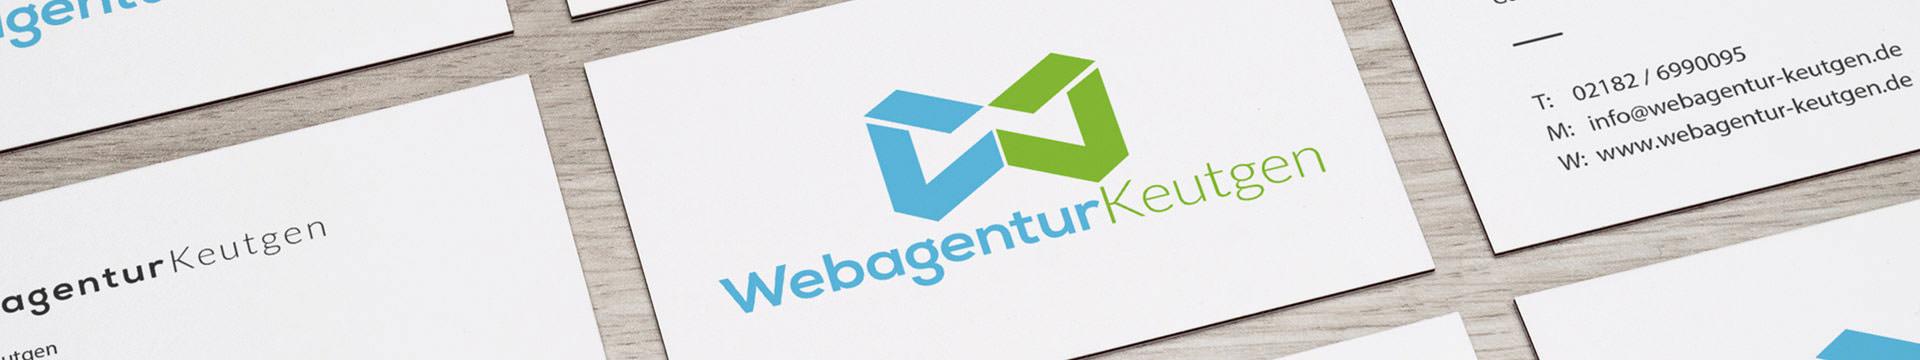 logo-print-grafik-design-responsive-webagentur-keutgen-grevenbroich